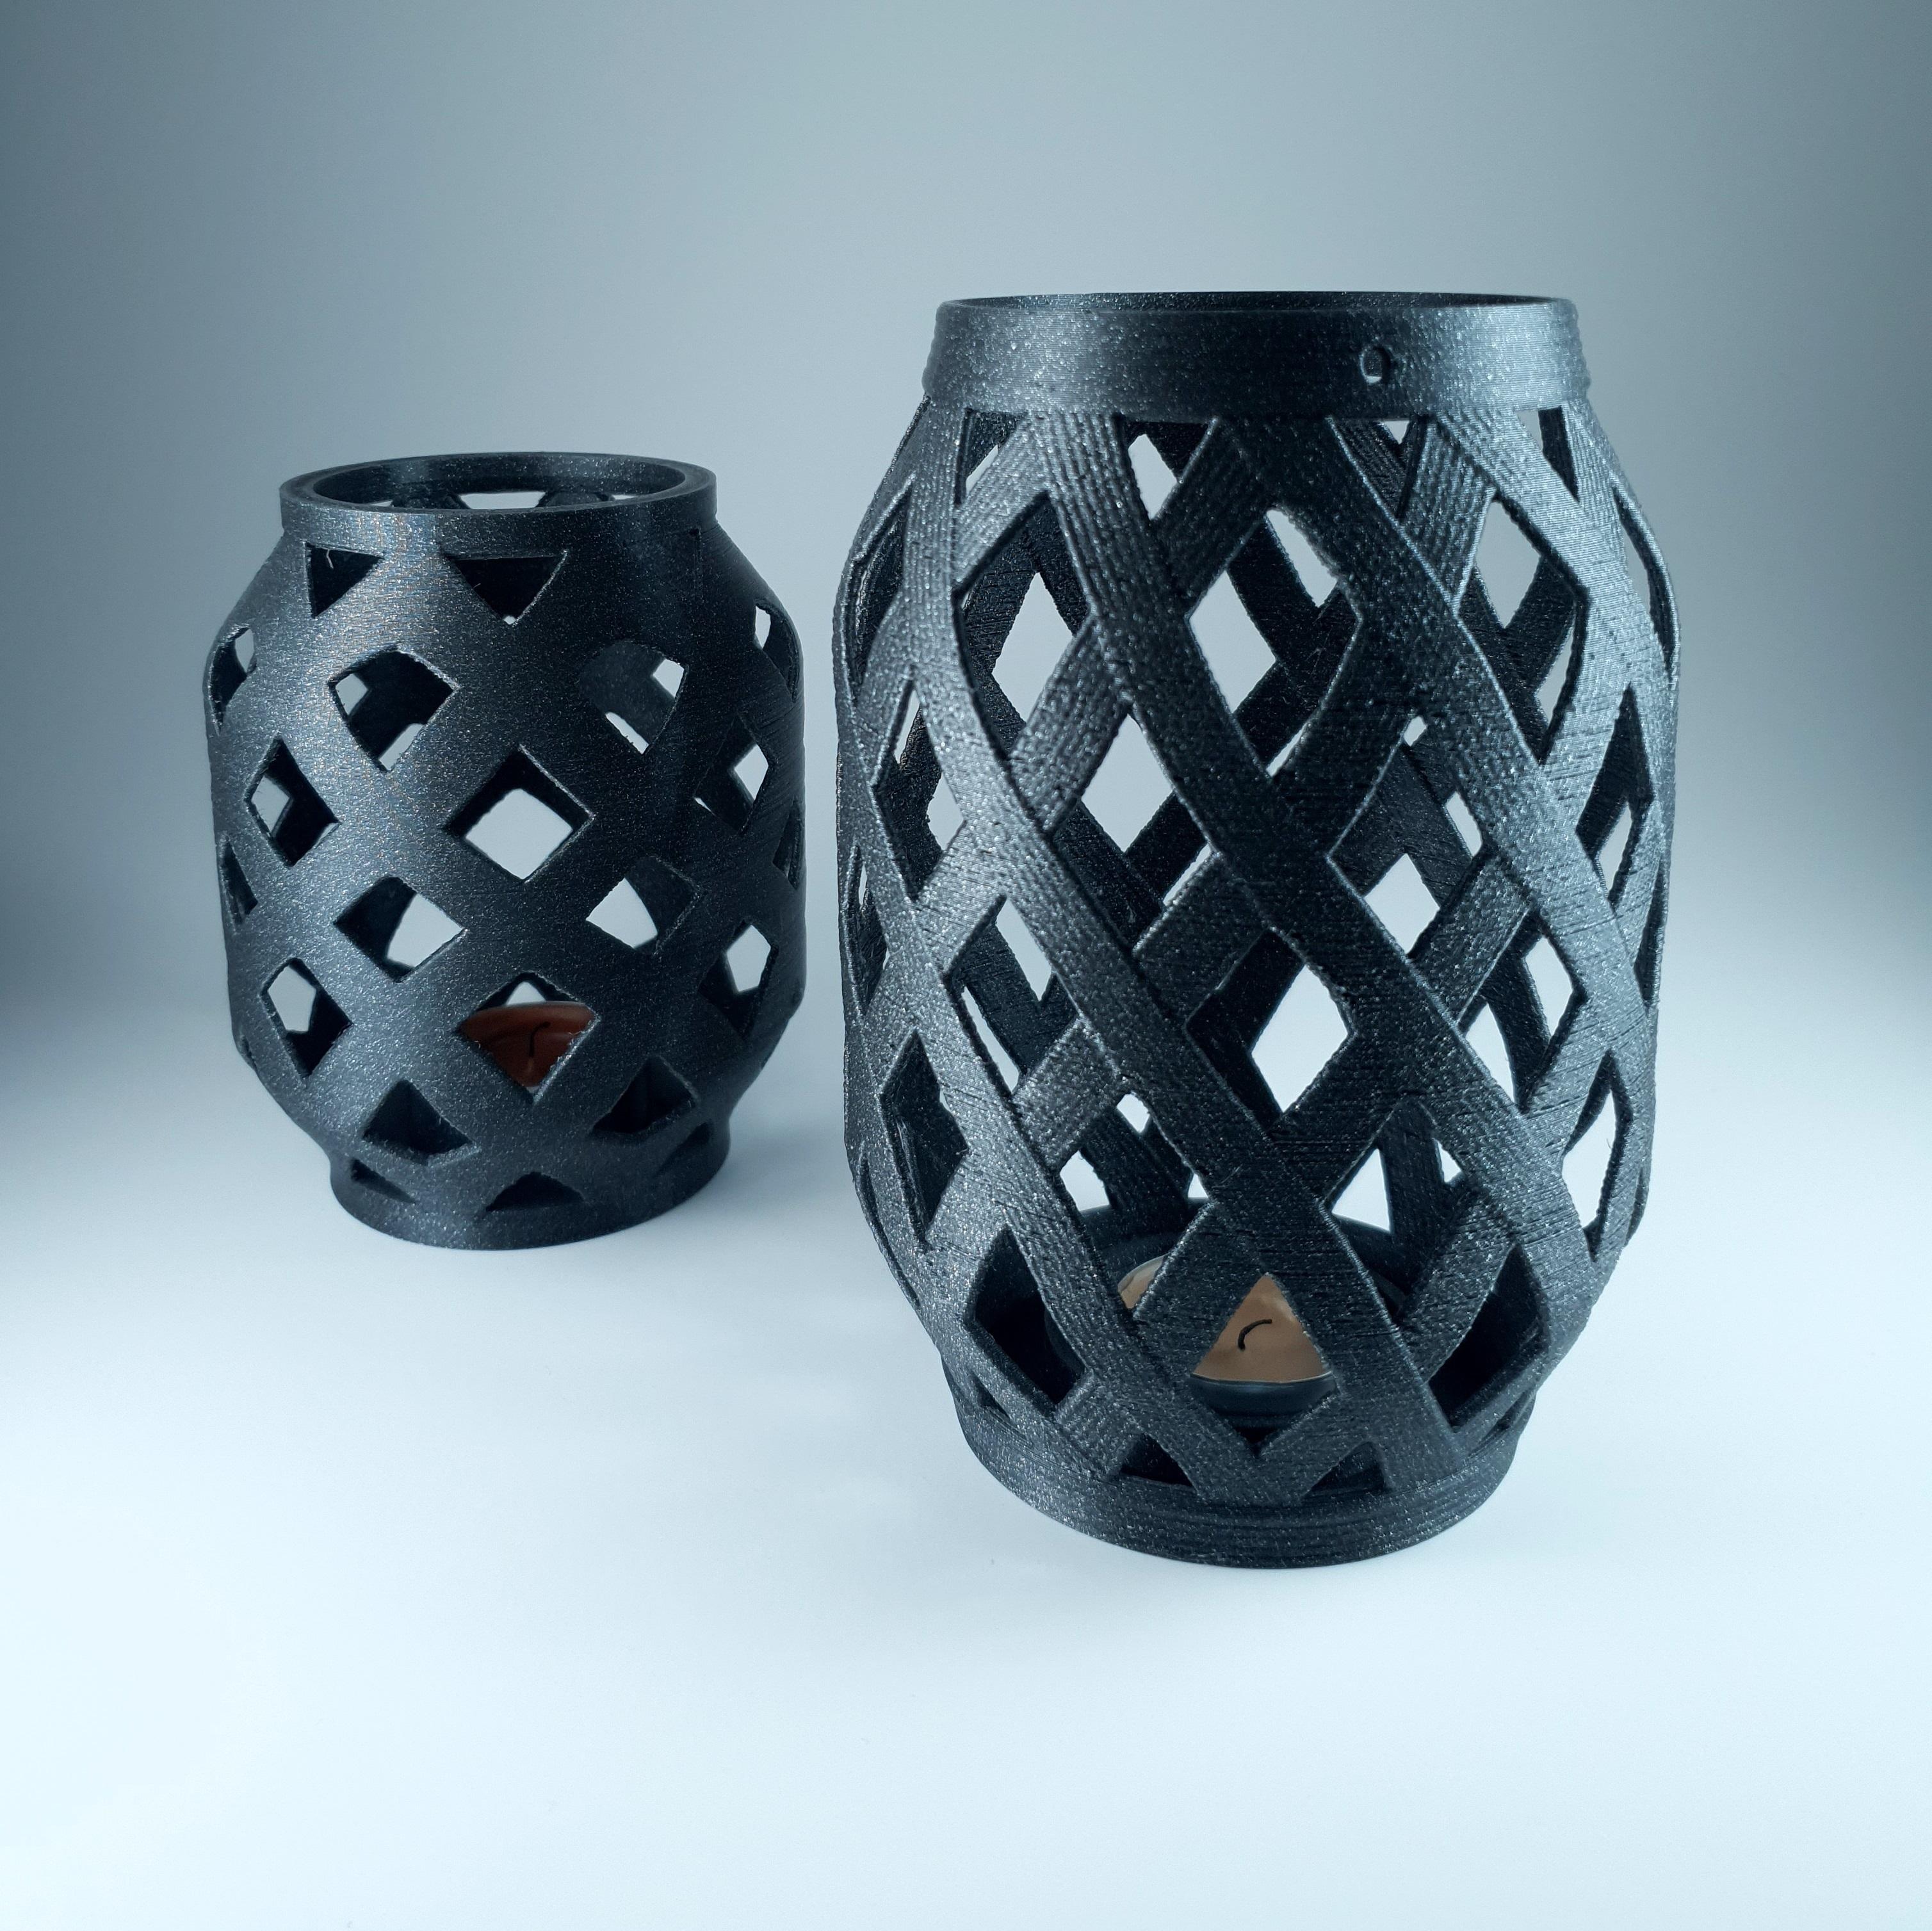 1.jpg Download free STL file Candle Lantern  • 3D printer template, 3D_Printing_Athens